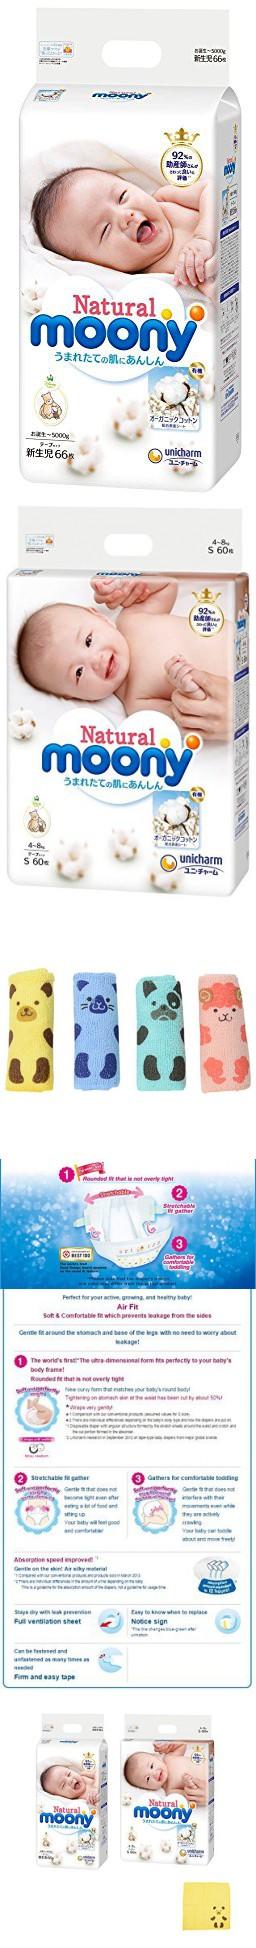 Japanese Soft Diapers Unicharm Natural Mooney ( Organic cotton ) 2 sizes Bundle Set , Newborn (2-5kg) 66 , S size (4-8kg) 60 ( Total 126sheets ) Tape Type Disposable Nappies , Original Hand Towel